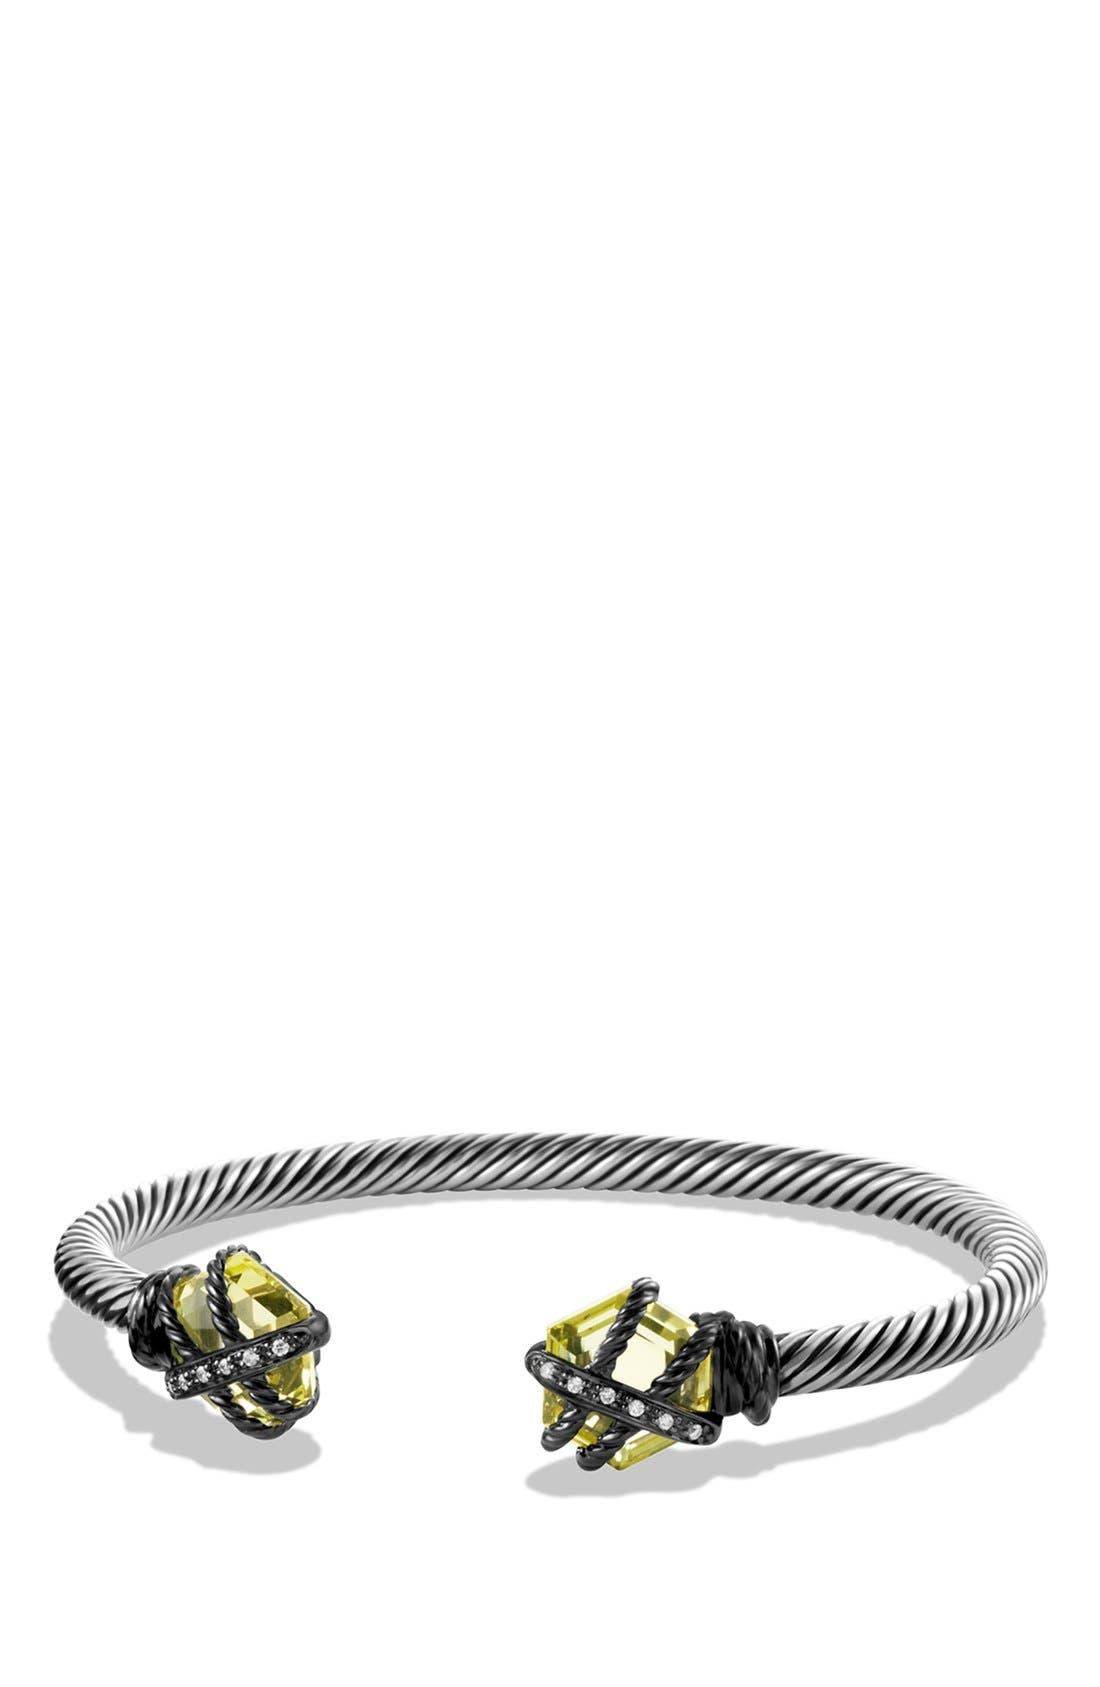 Alternate Image 1 Selected - David Yurman 'Cable Wrap' Bracelet with Lemon Citrine and Diamonds